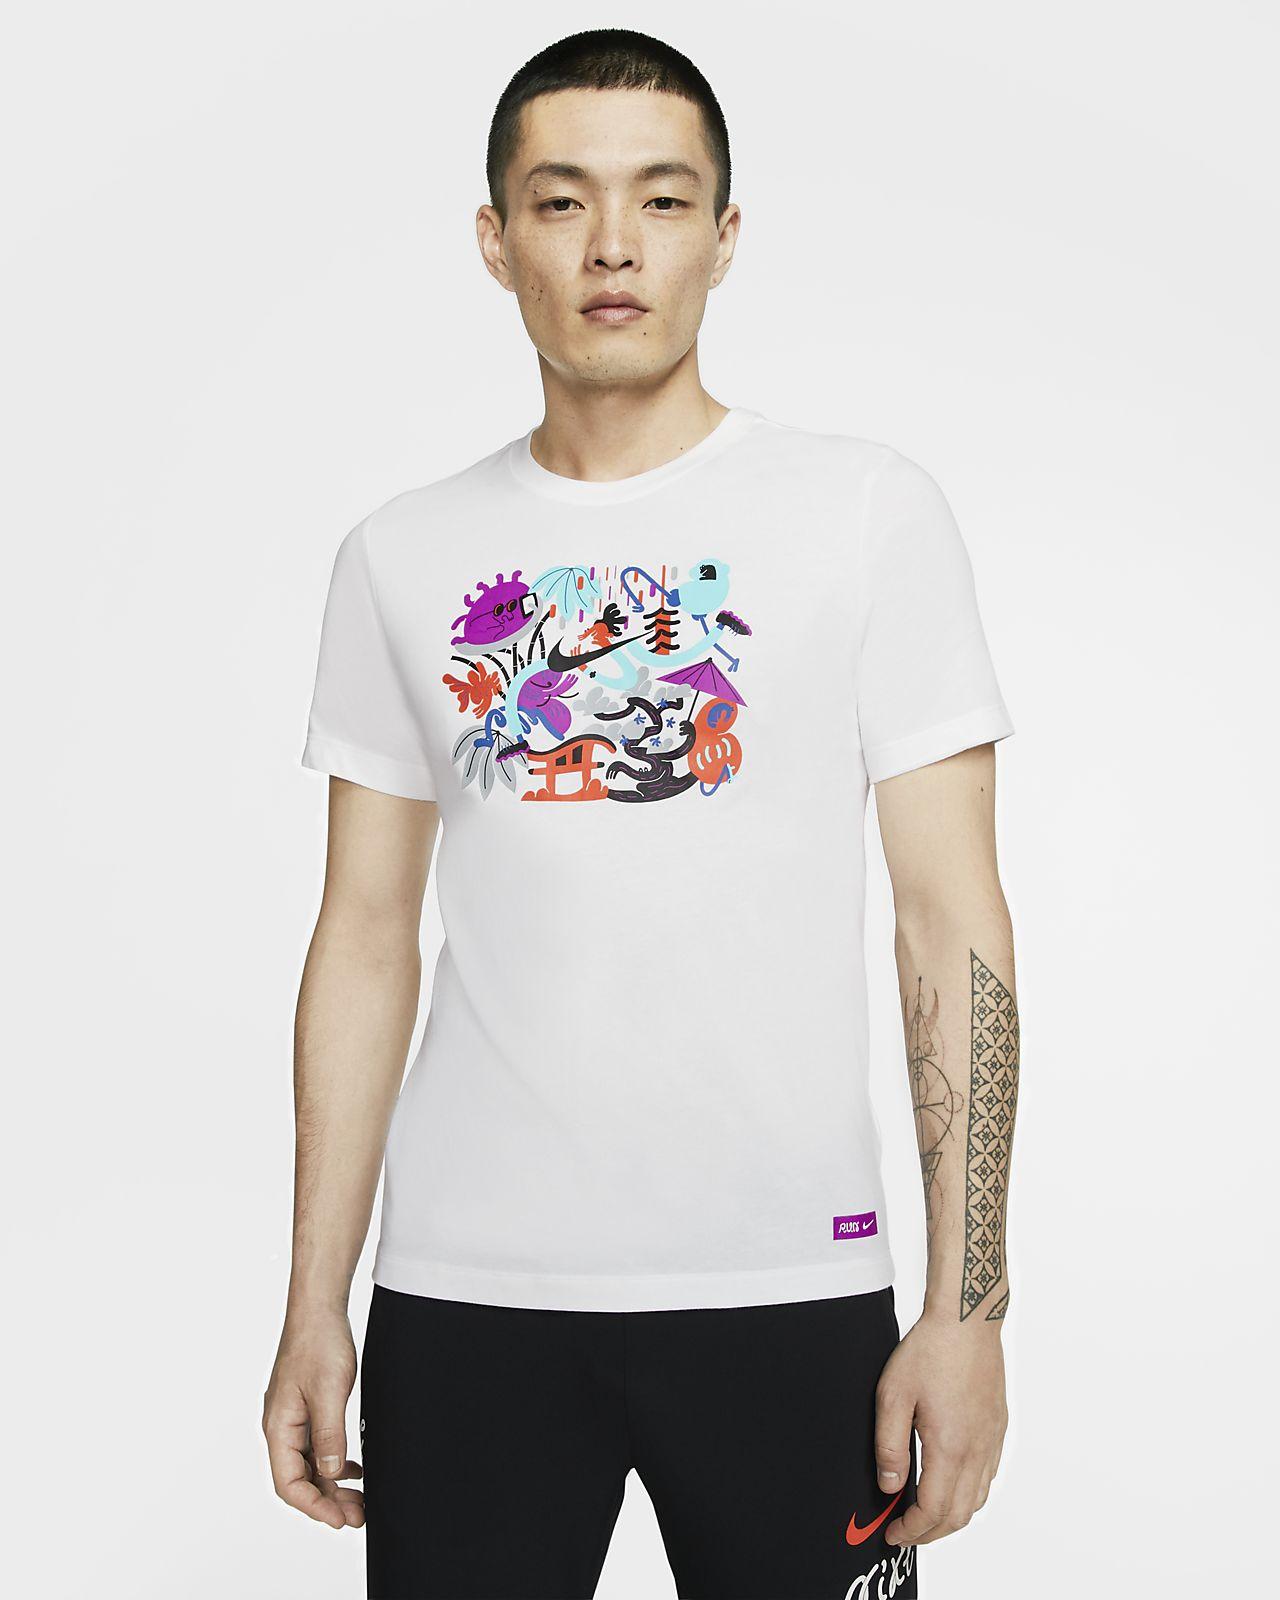 Nike Dri-FIT Men's T-Shirt